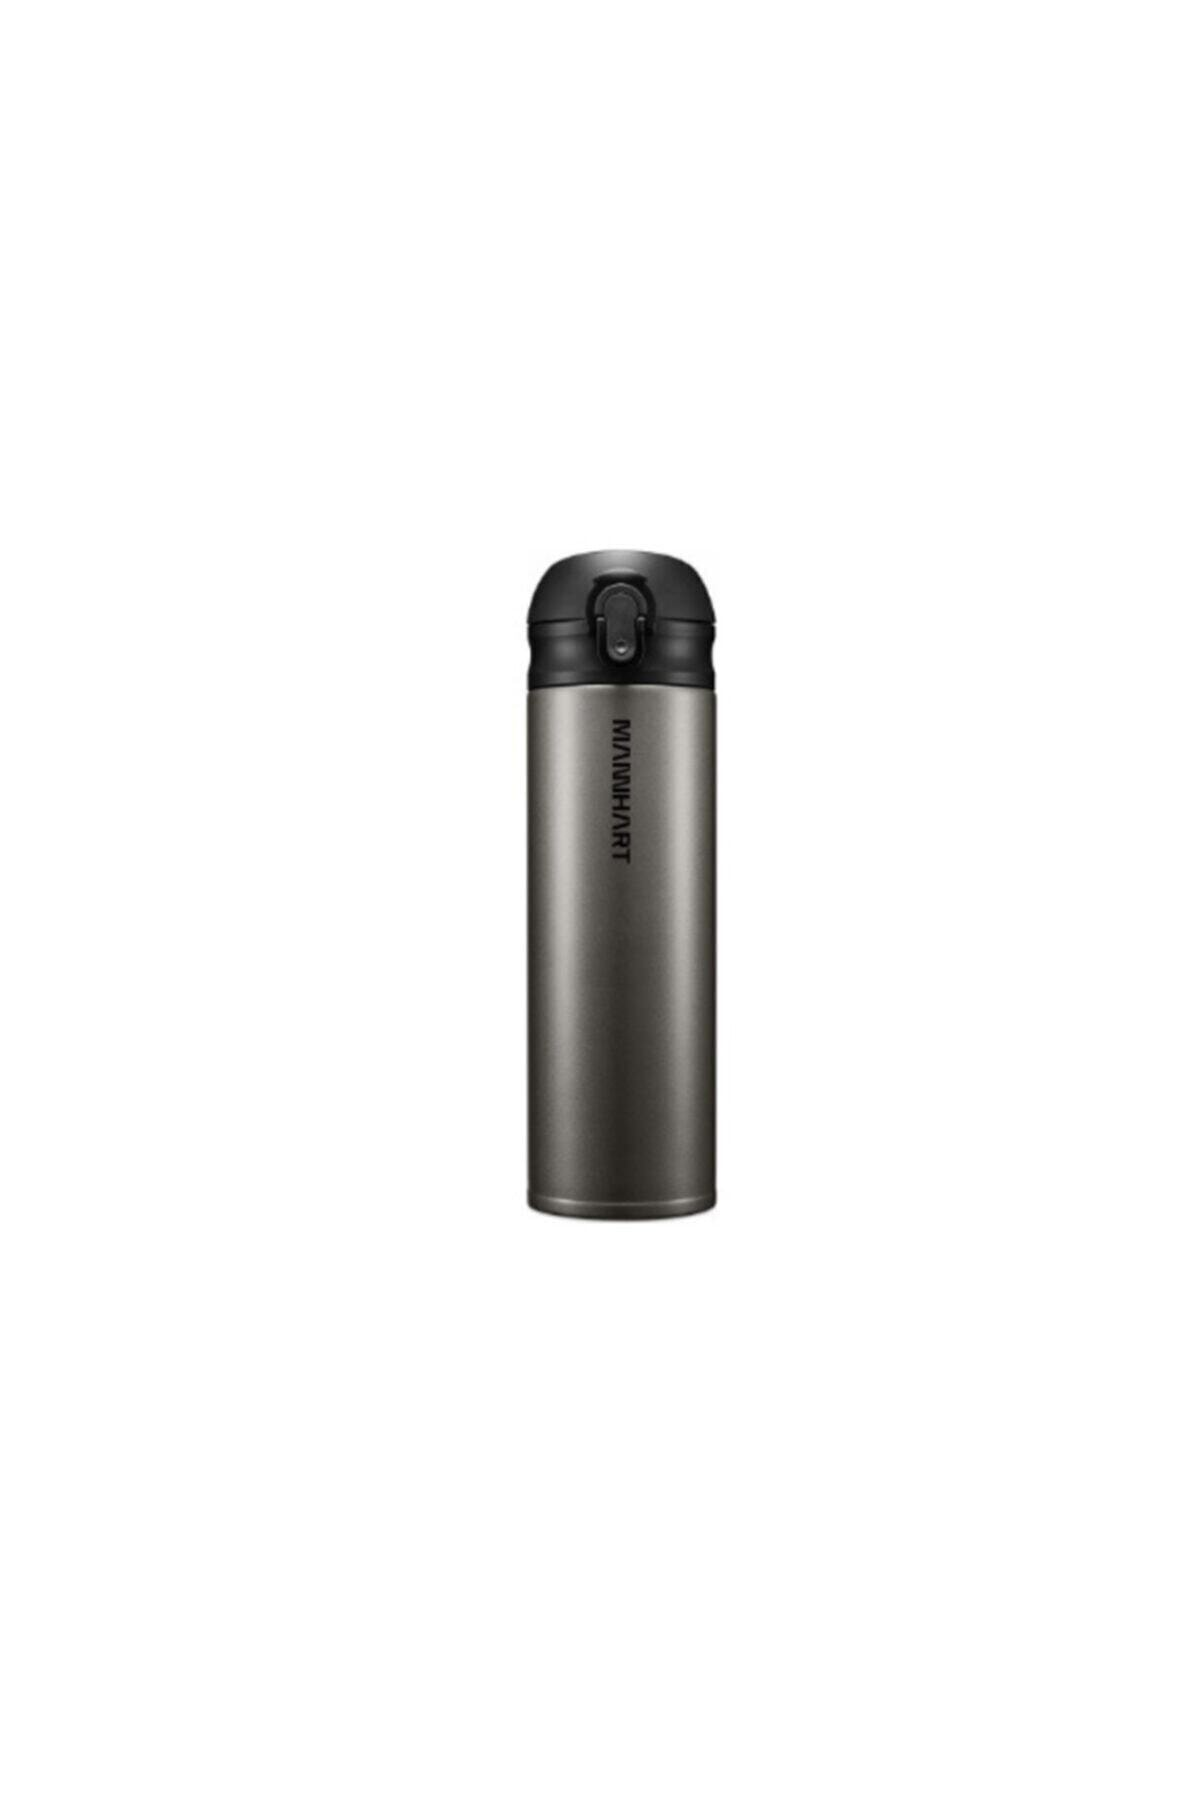 Spigen Mannhart By B203 Hafif Ve Ince Sızdırmaz Çift Kilit Mekanizmalı Katmanlı Travel Mug Termos 500 ml 1